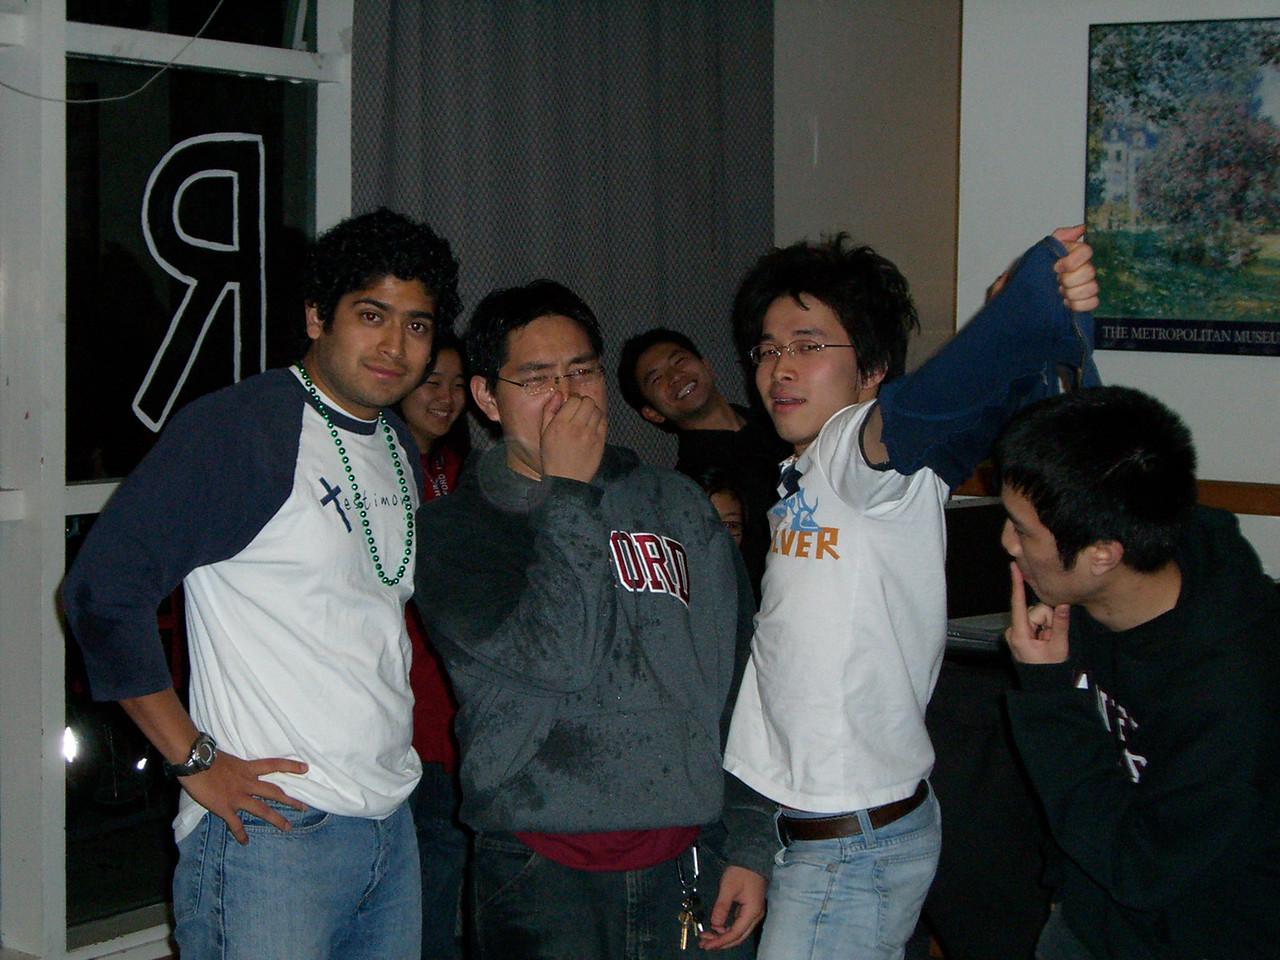 2006 03 01 Wed - David Chiang's B-day - Pablo Pozo, David Chiang, Hyungsoo Kim, & Michael Lin 1